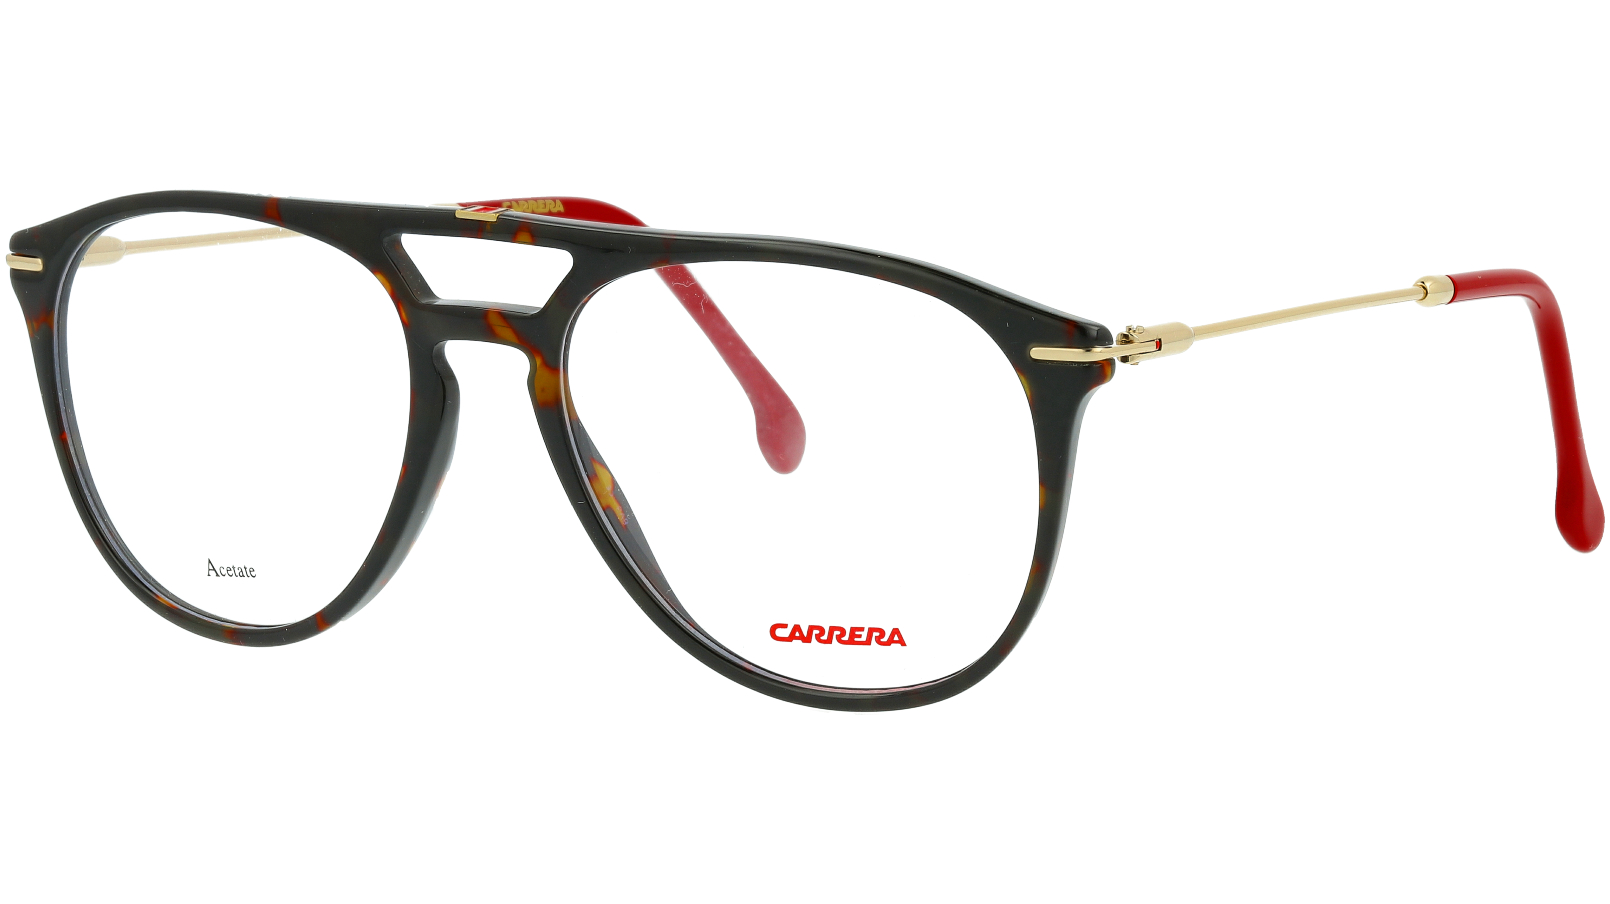 CARRERA CARRERA 168/V 086 53 DARK Glasses